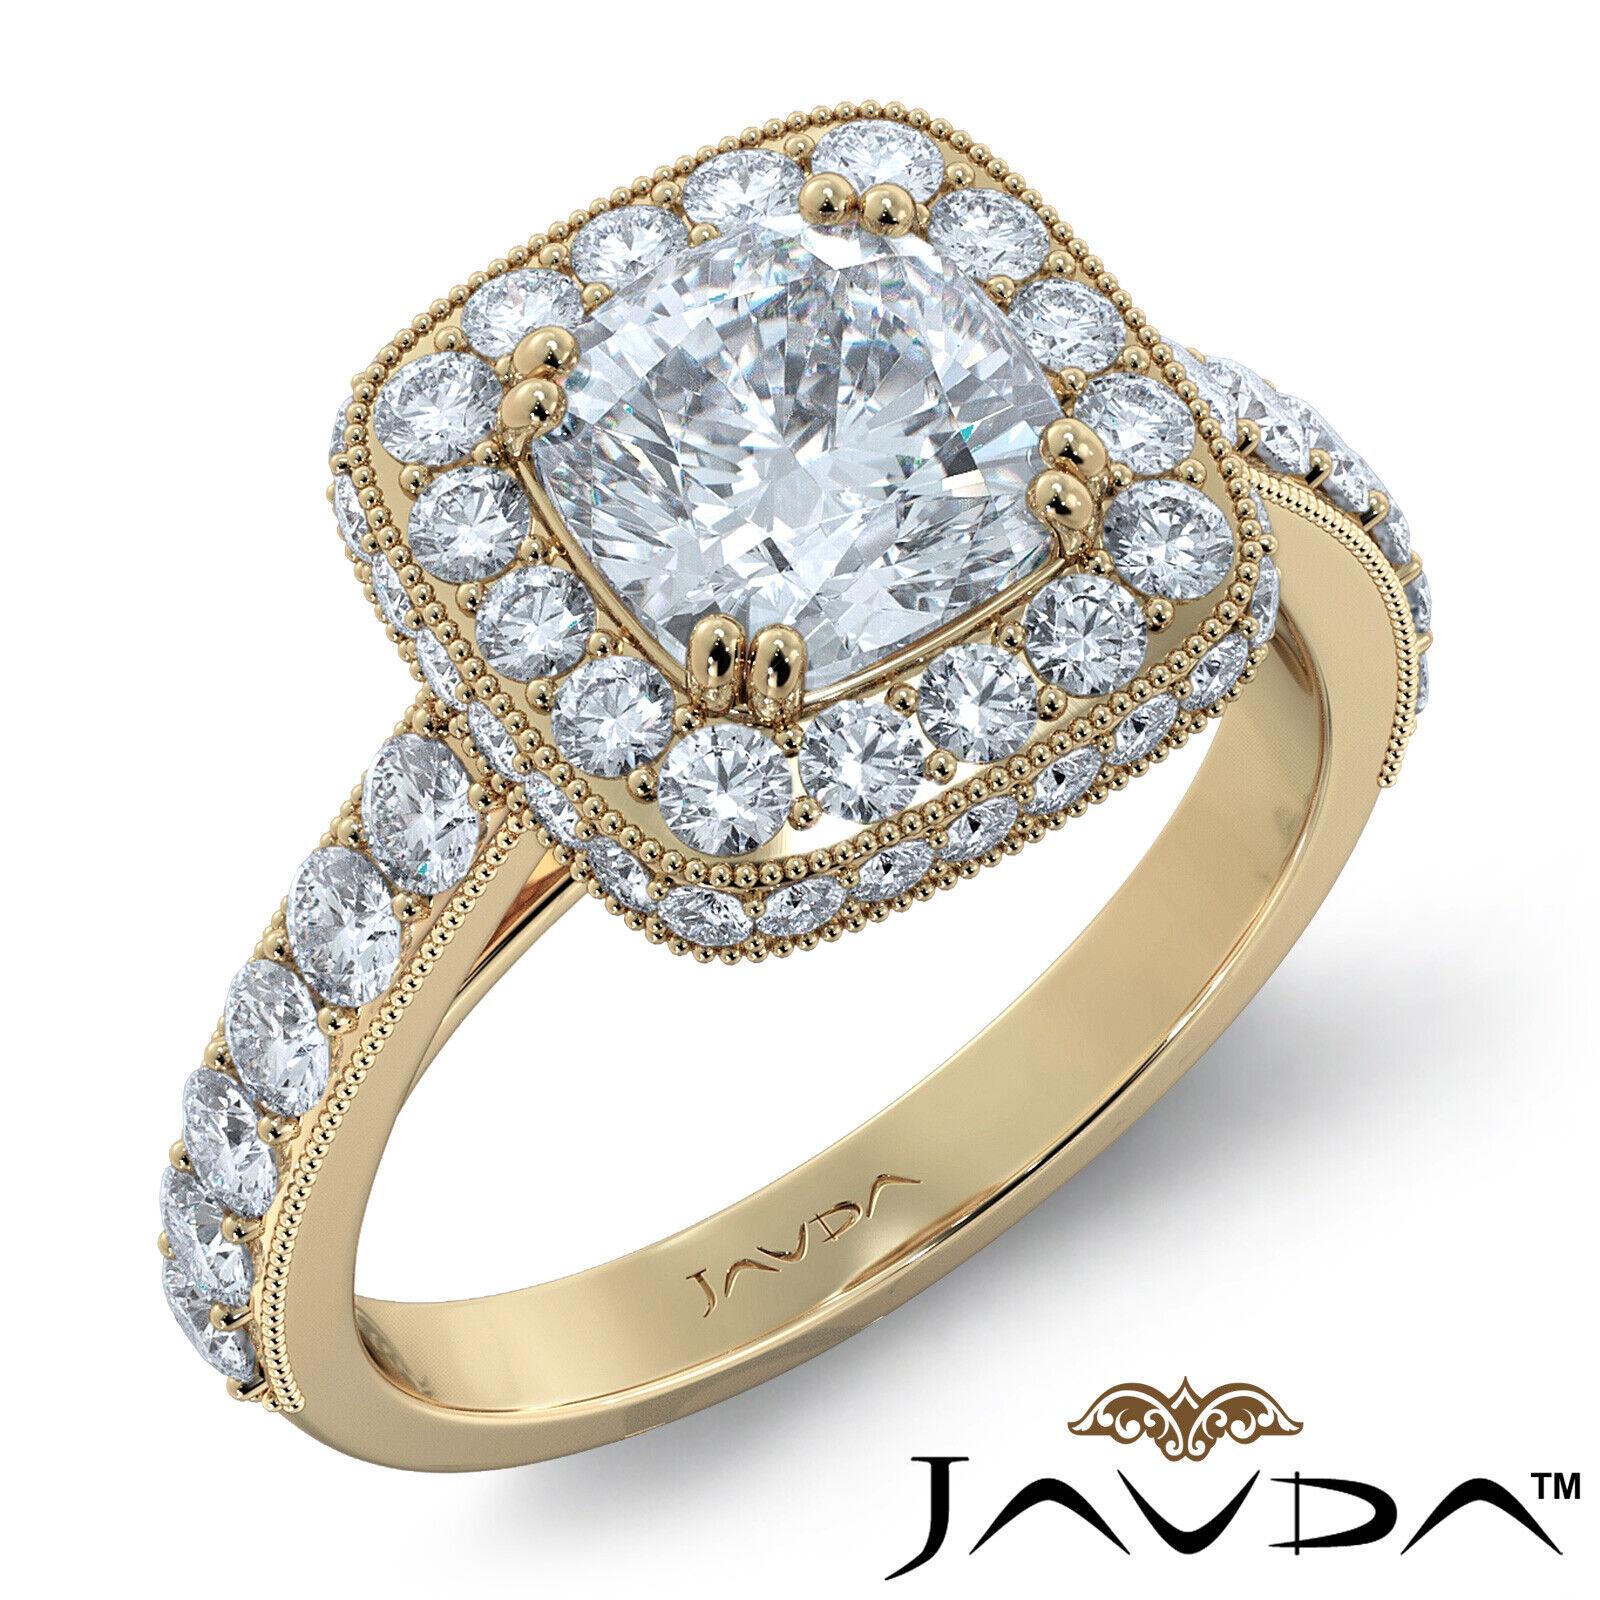 2ctw Milgrain Halo Floral Basket Cushion Diamond Engagement Ring GIA H-VS2 Gold 7